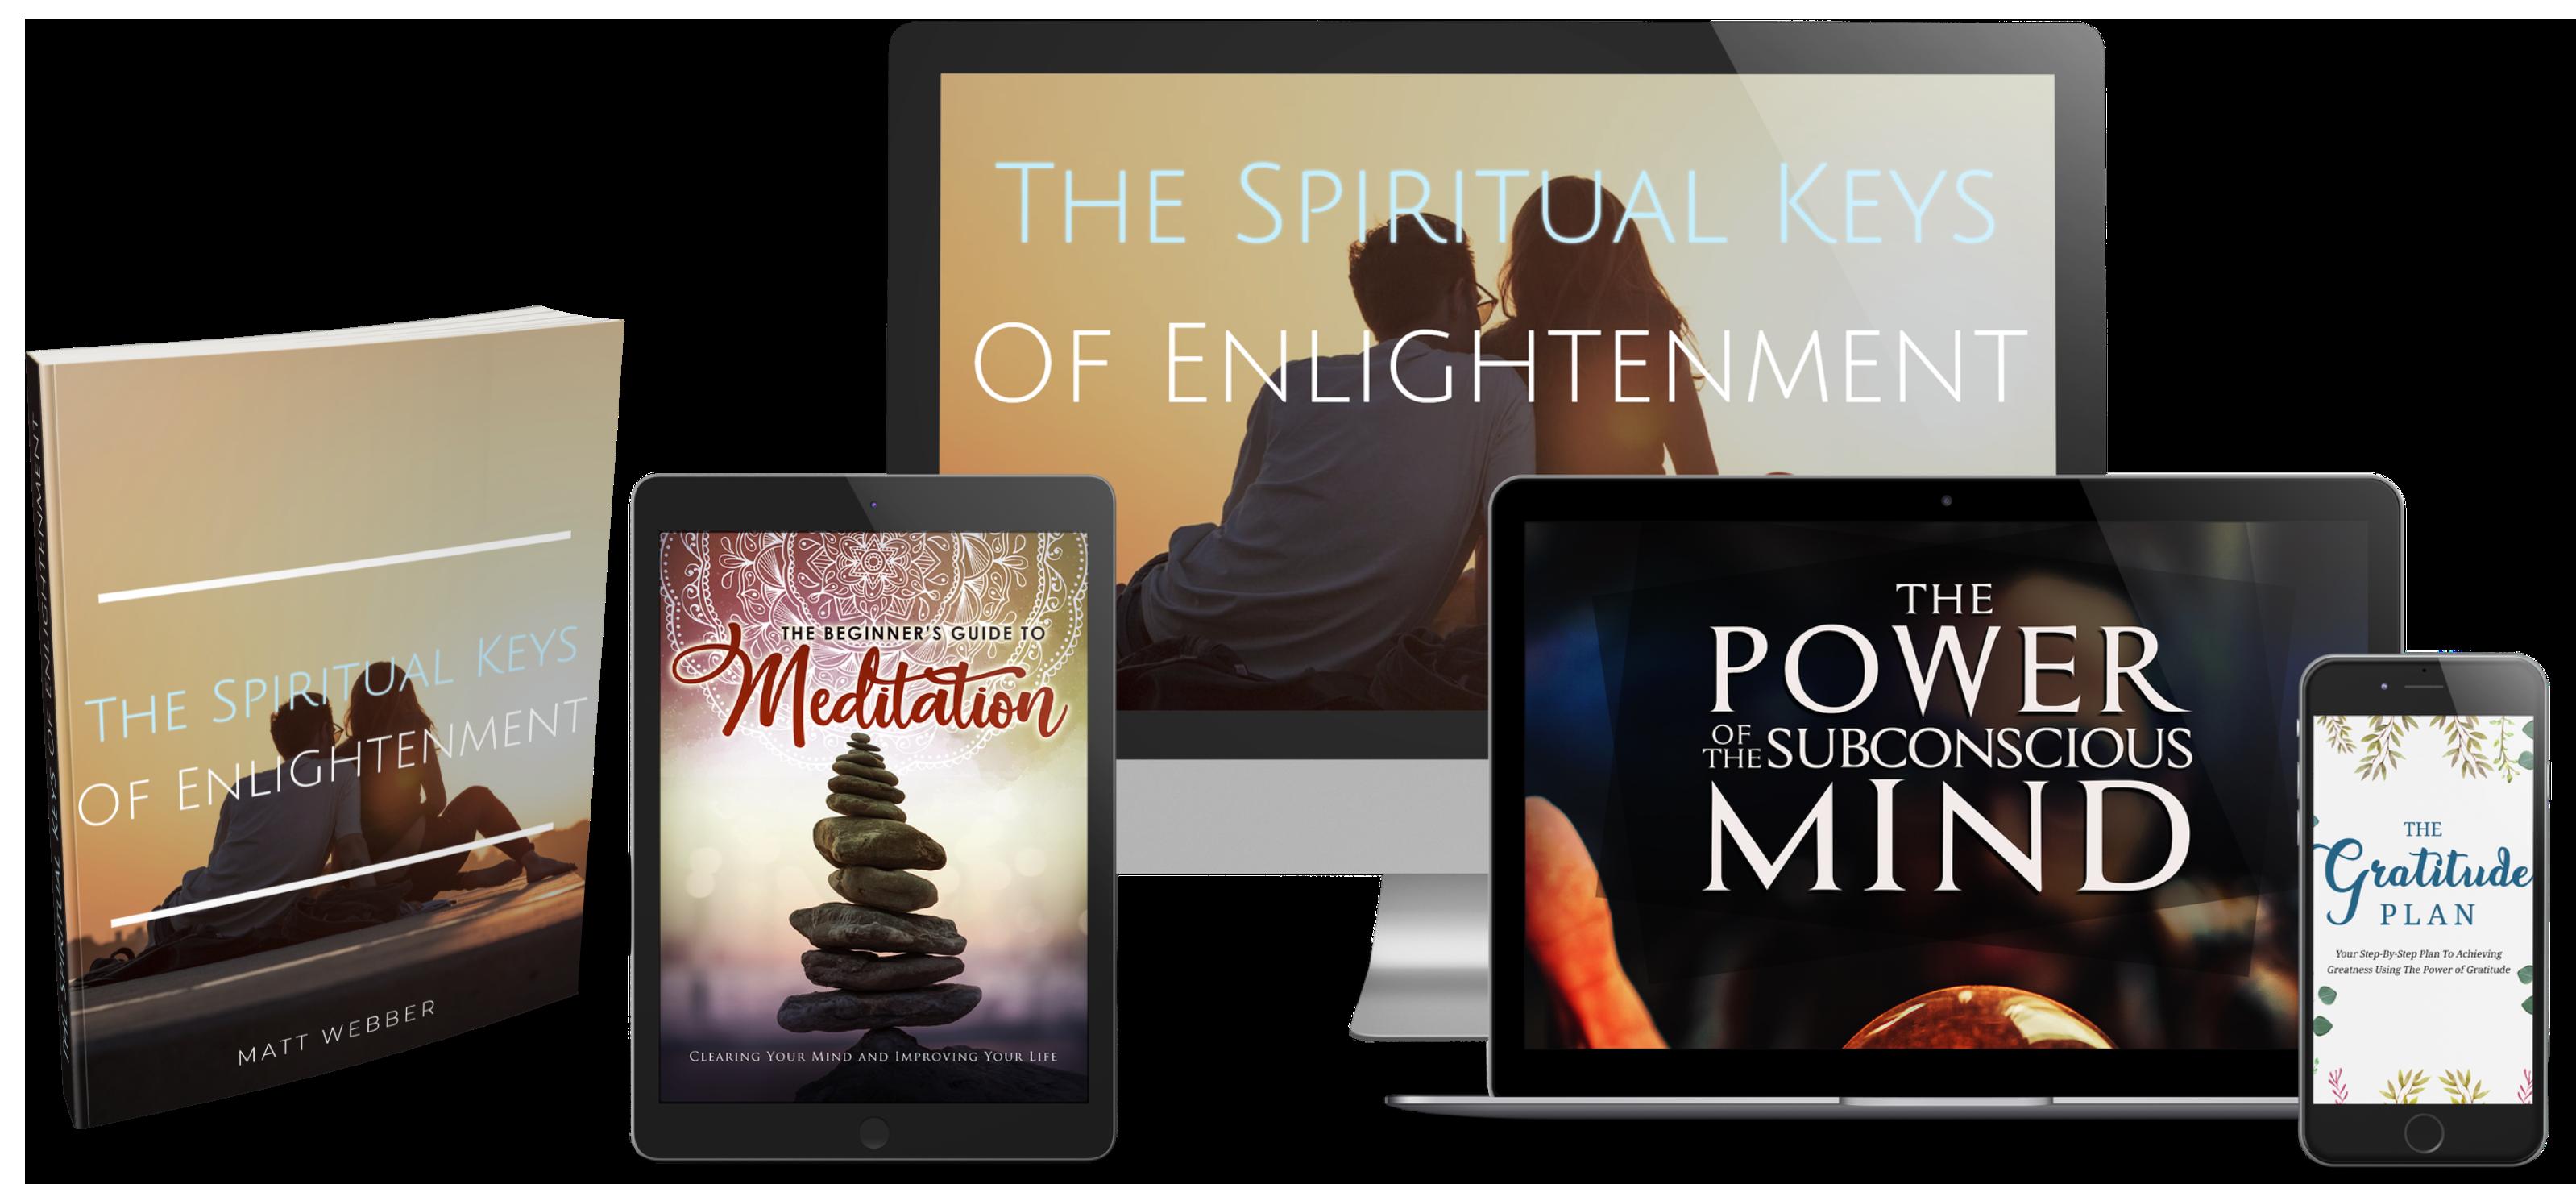 The Spiritual Keys Of Enlightenment